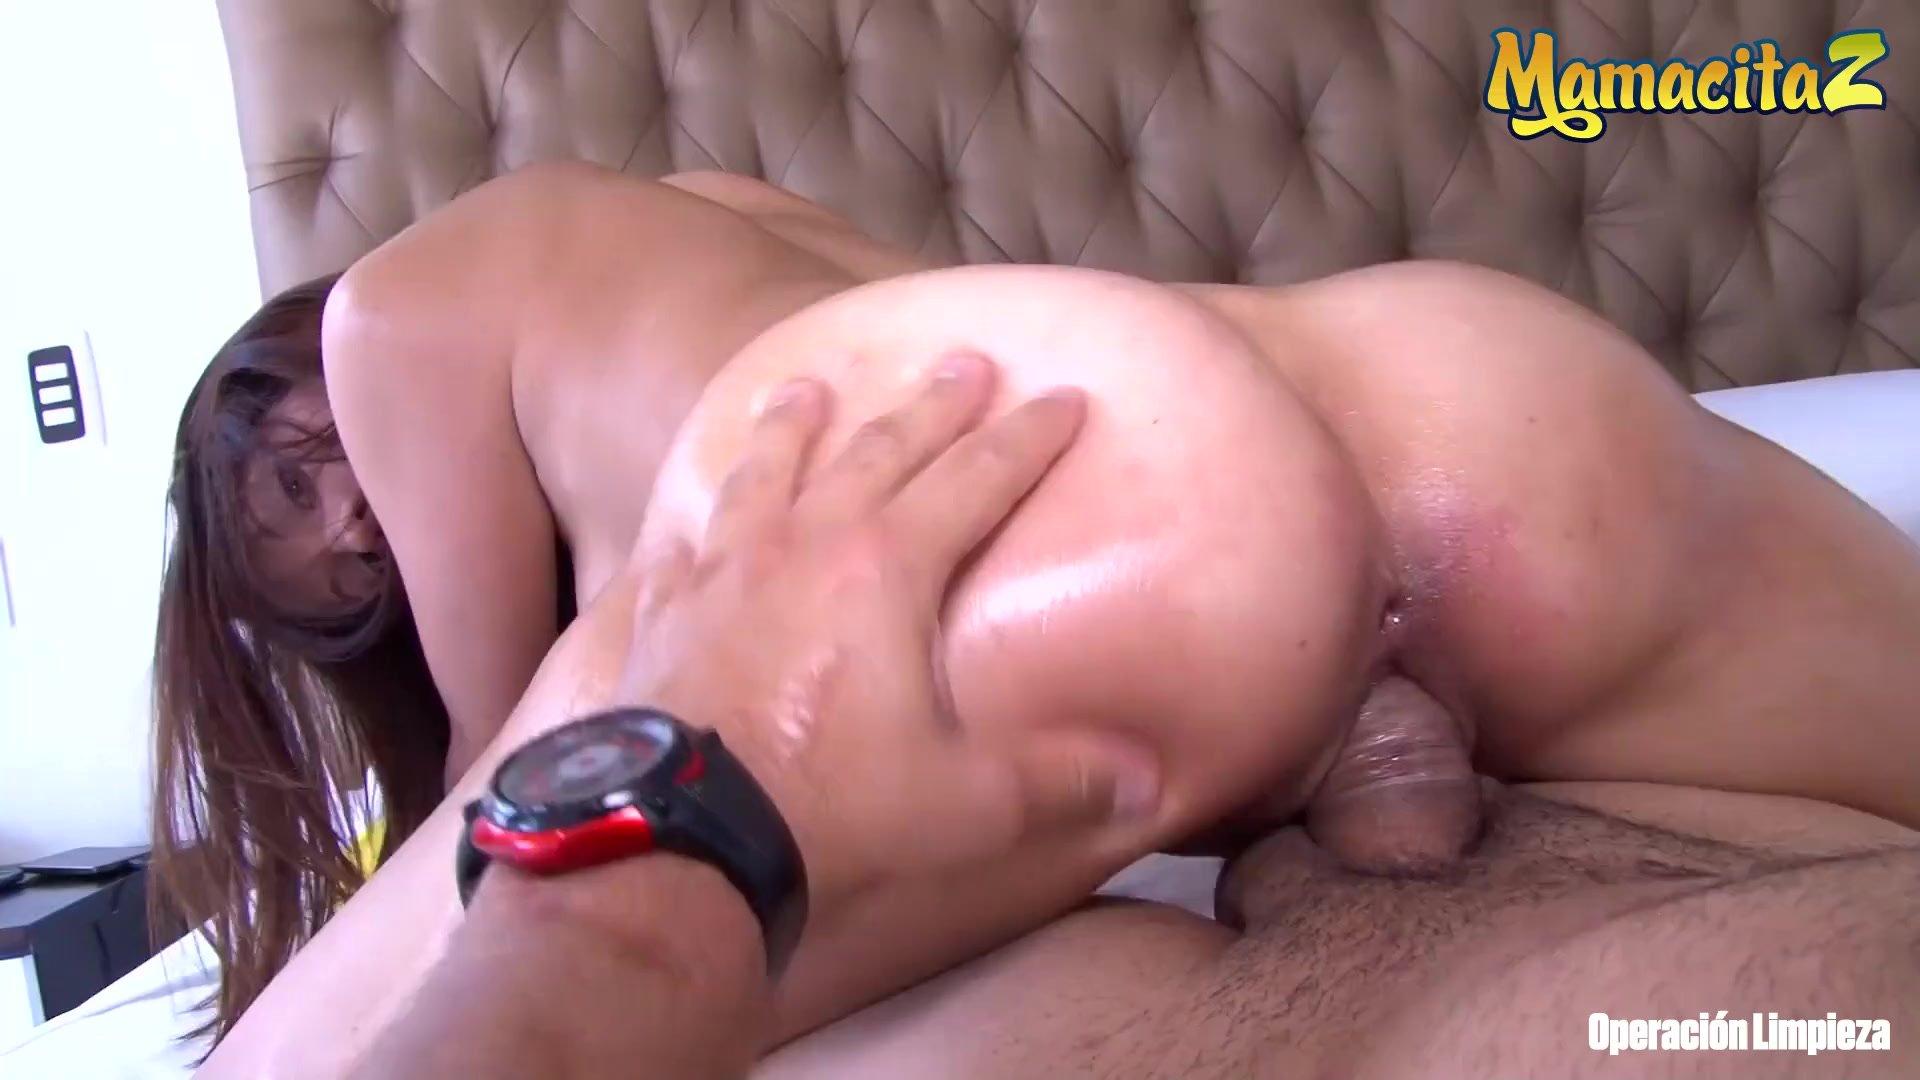 MamacitaZ - My Sexy Colombian Maid Twerks Her Big Ass Like a Pro